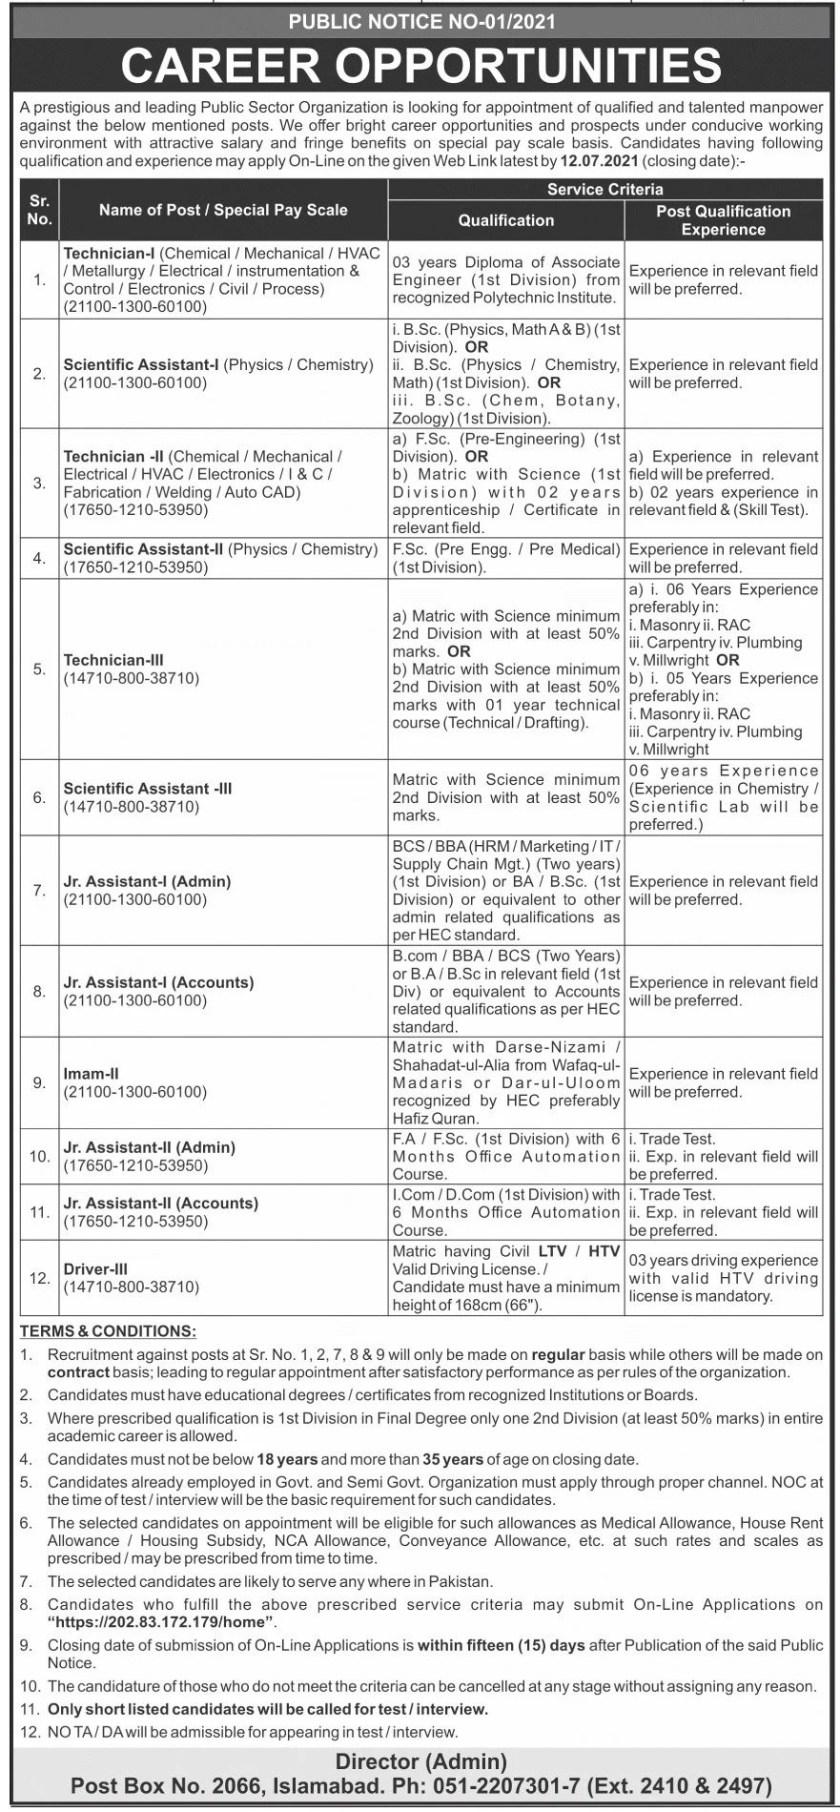 Public Sector Organization PO Box 2066 Islamabad Jobs 2021